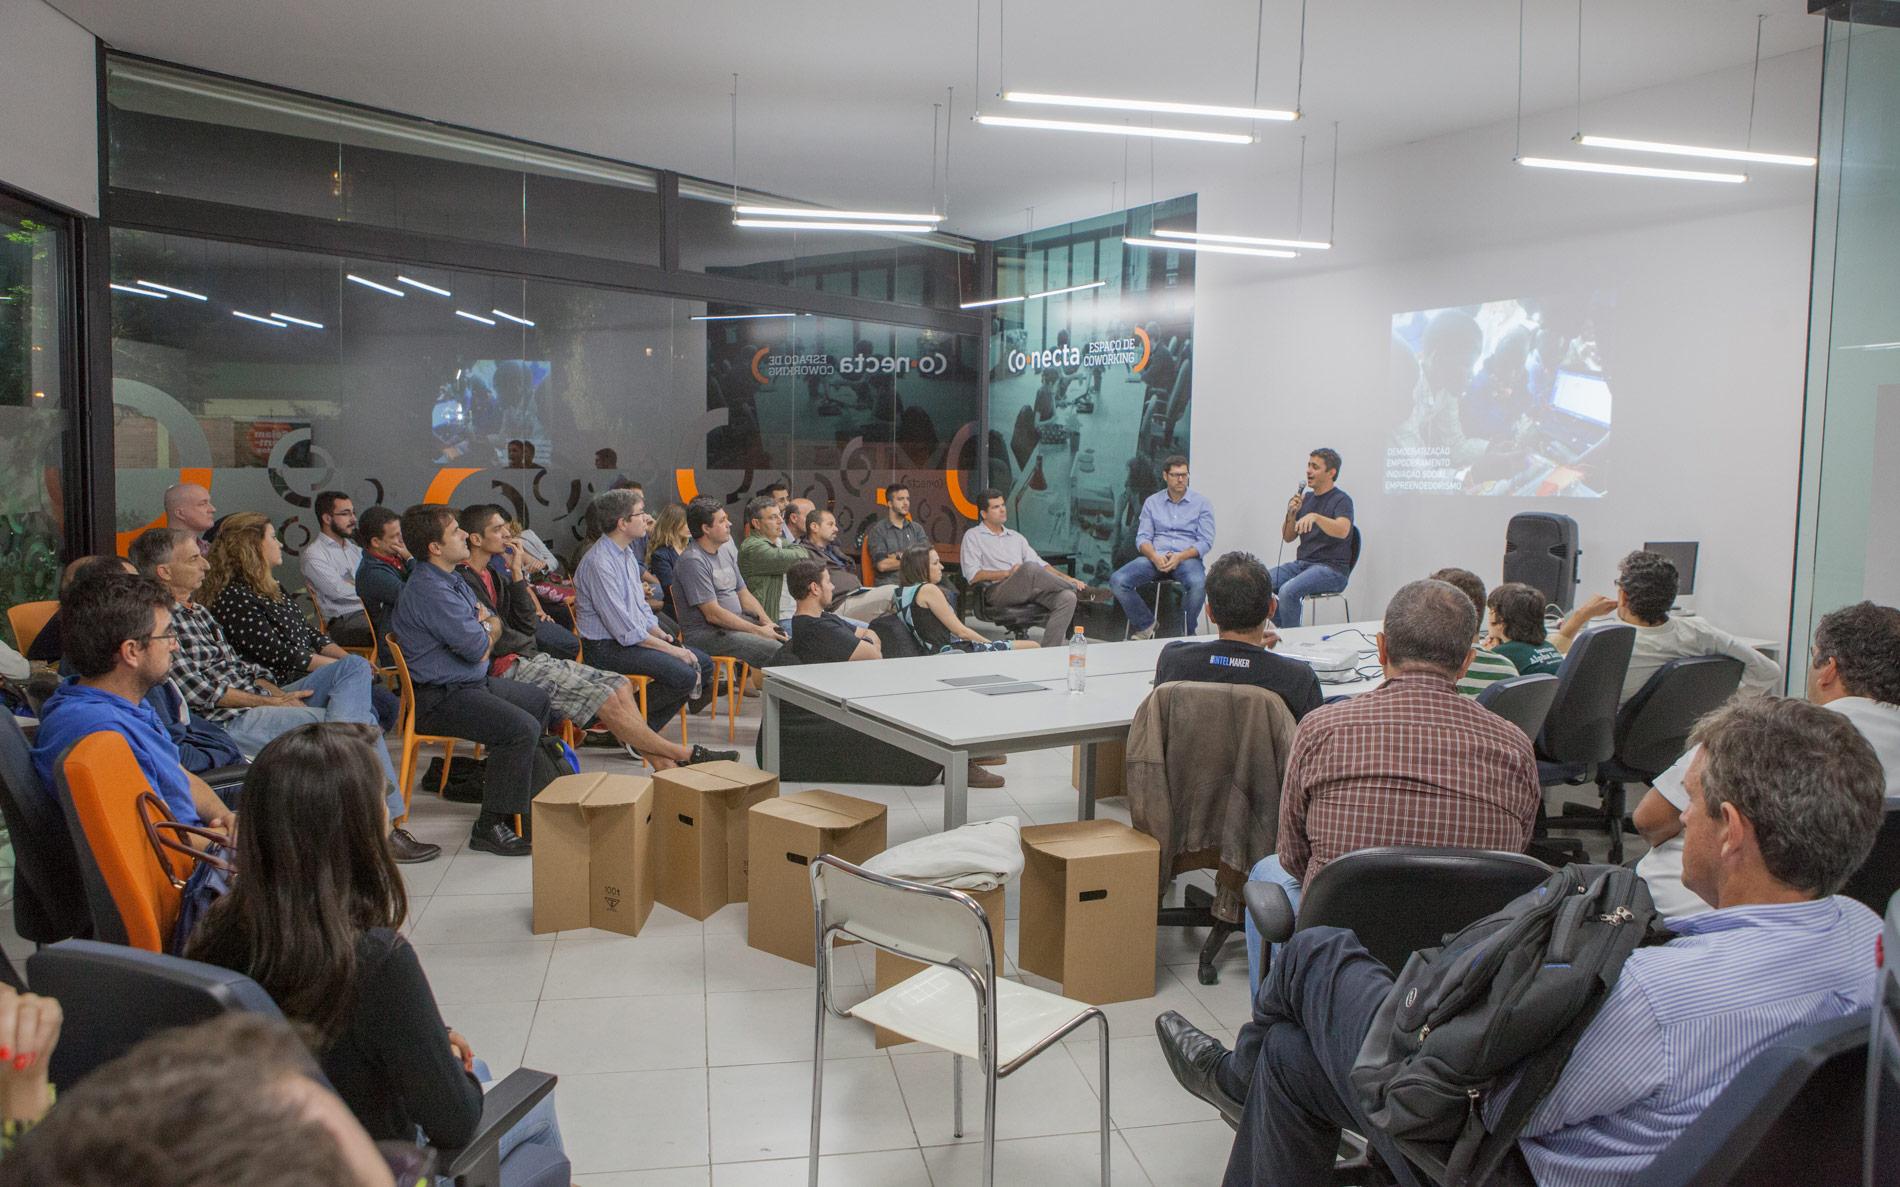 GOOD-IDEAS-conecta-coworking-sjcampos-sj